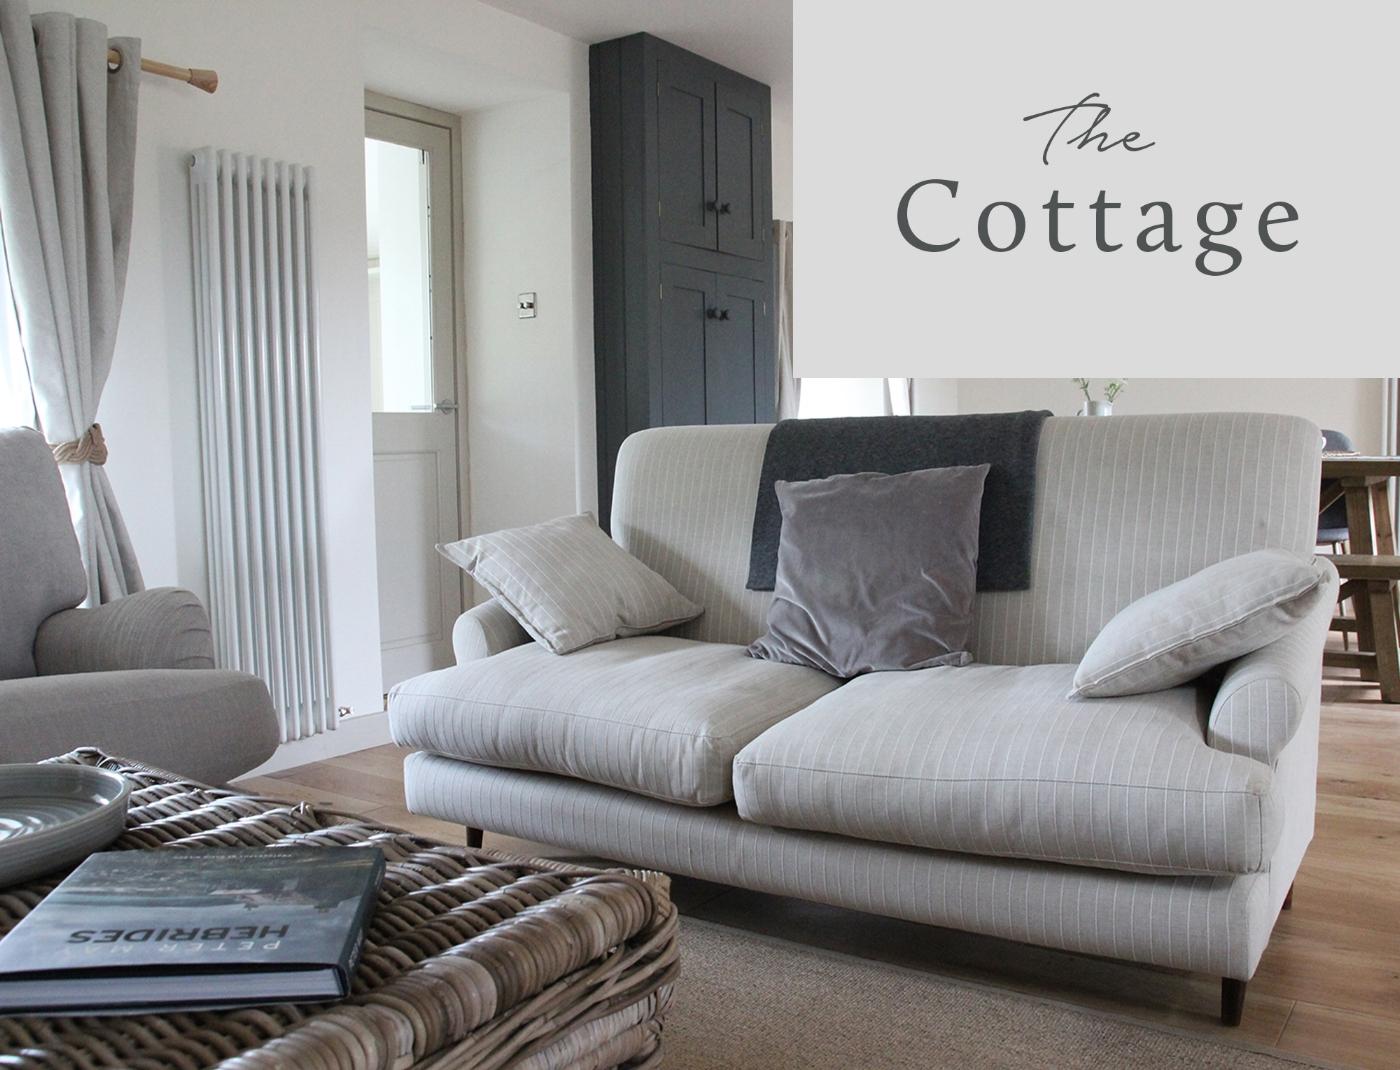 Holiday Cottage Dunkeld, Perthshire, Scotland